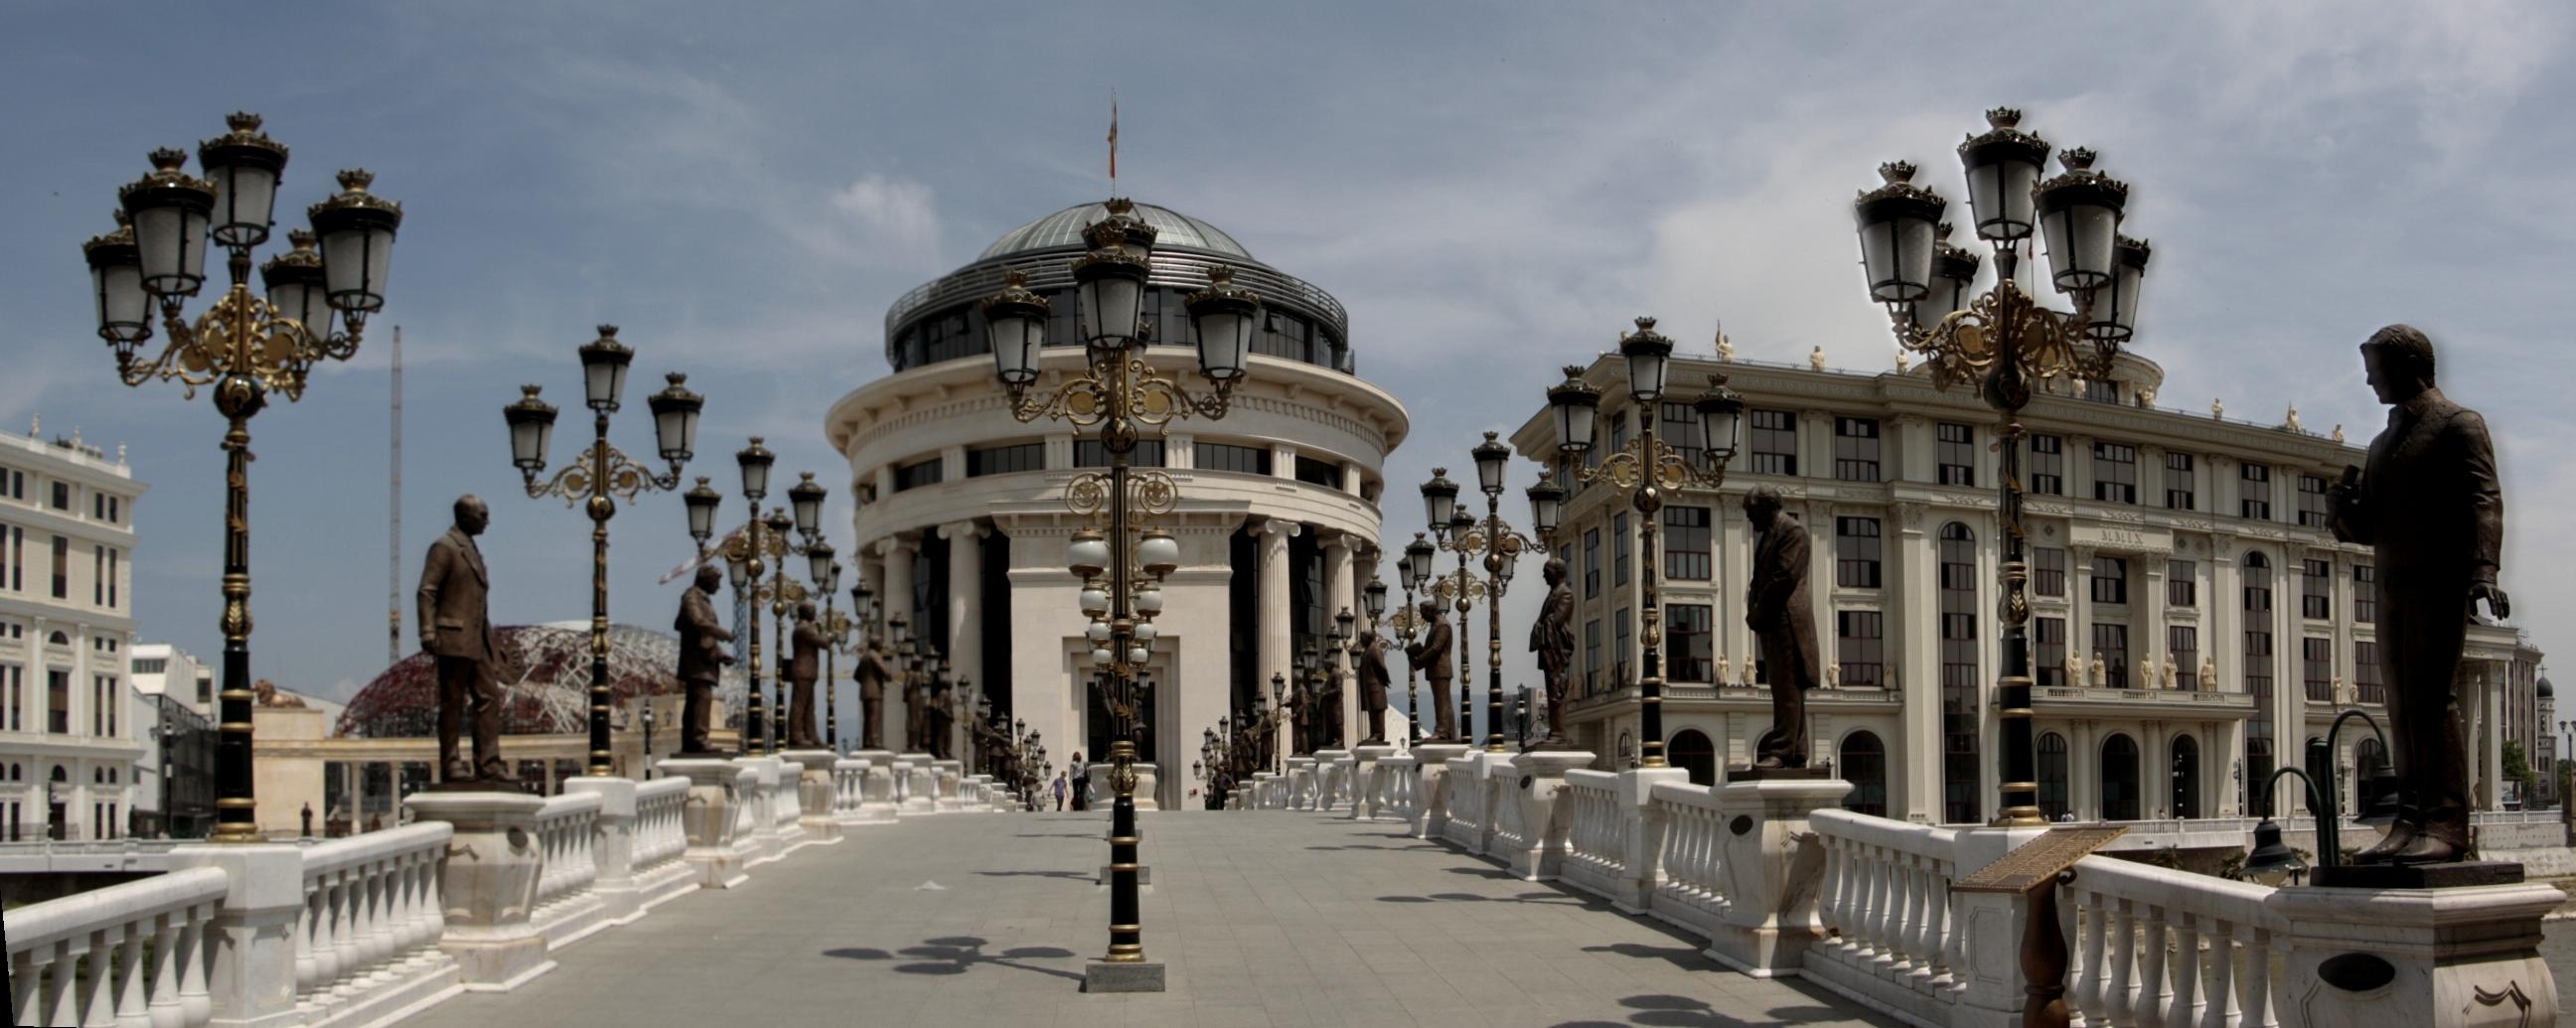 The Bridge of Art, Skopje, Macedonia